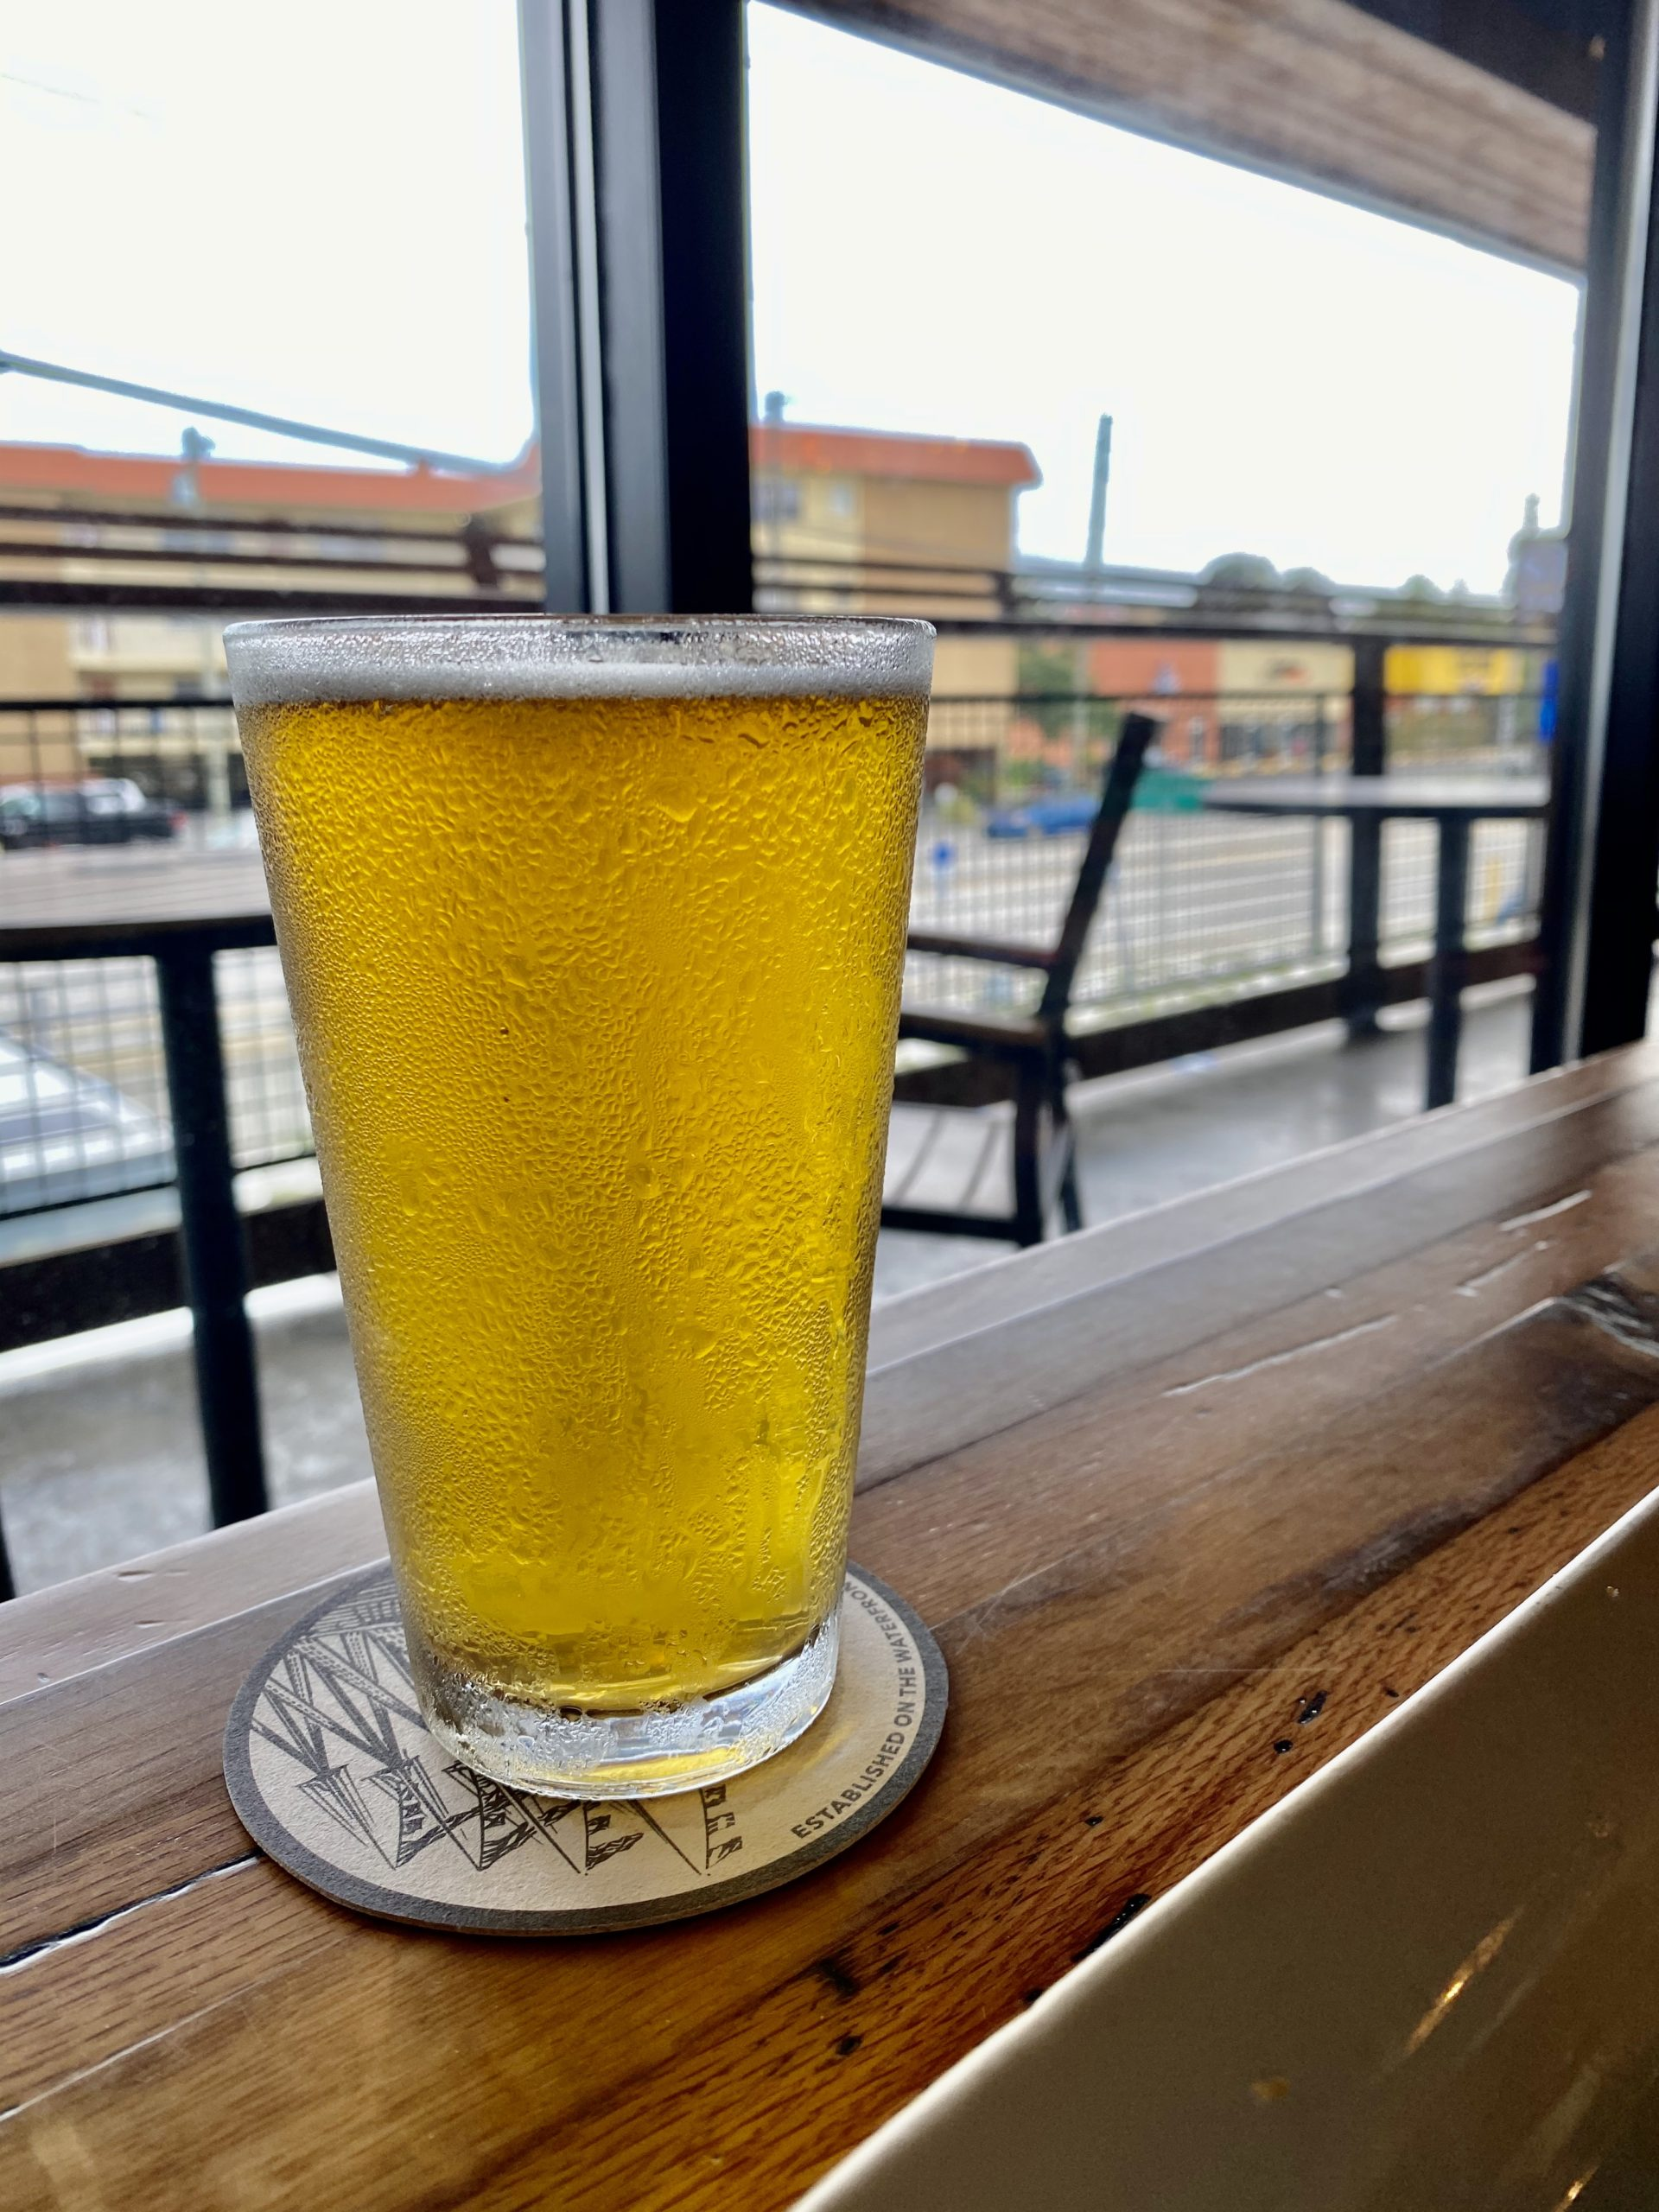 Sea Dog Sunfish Wheat Beer